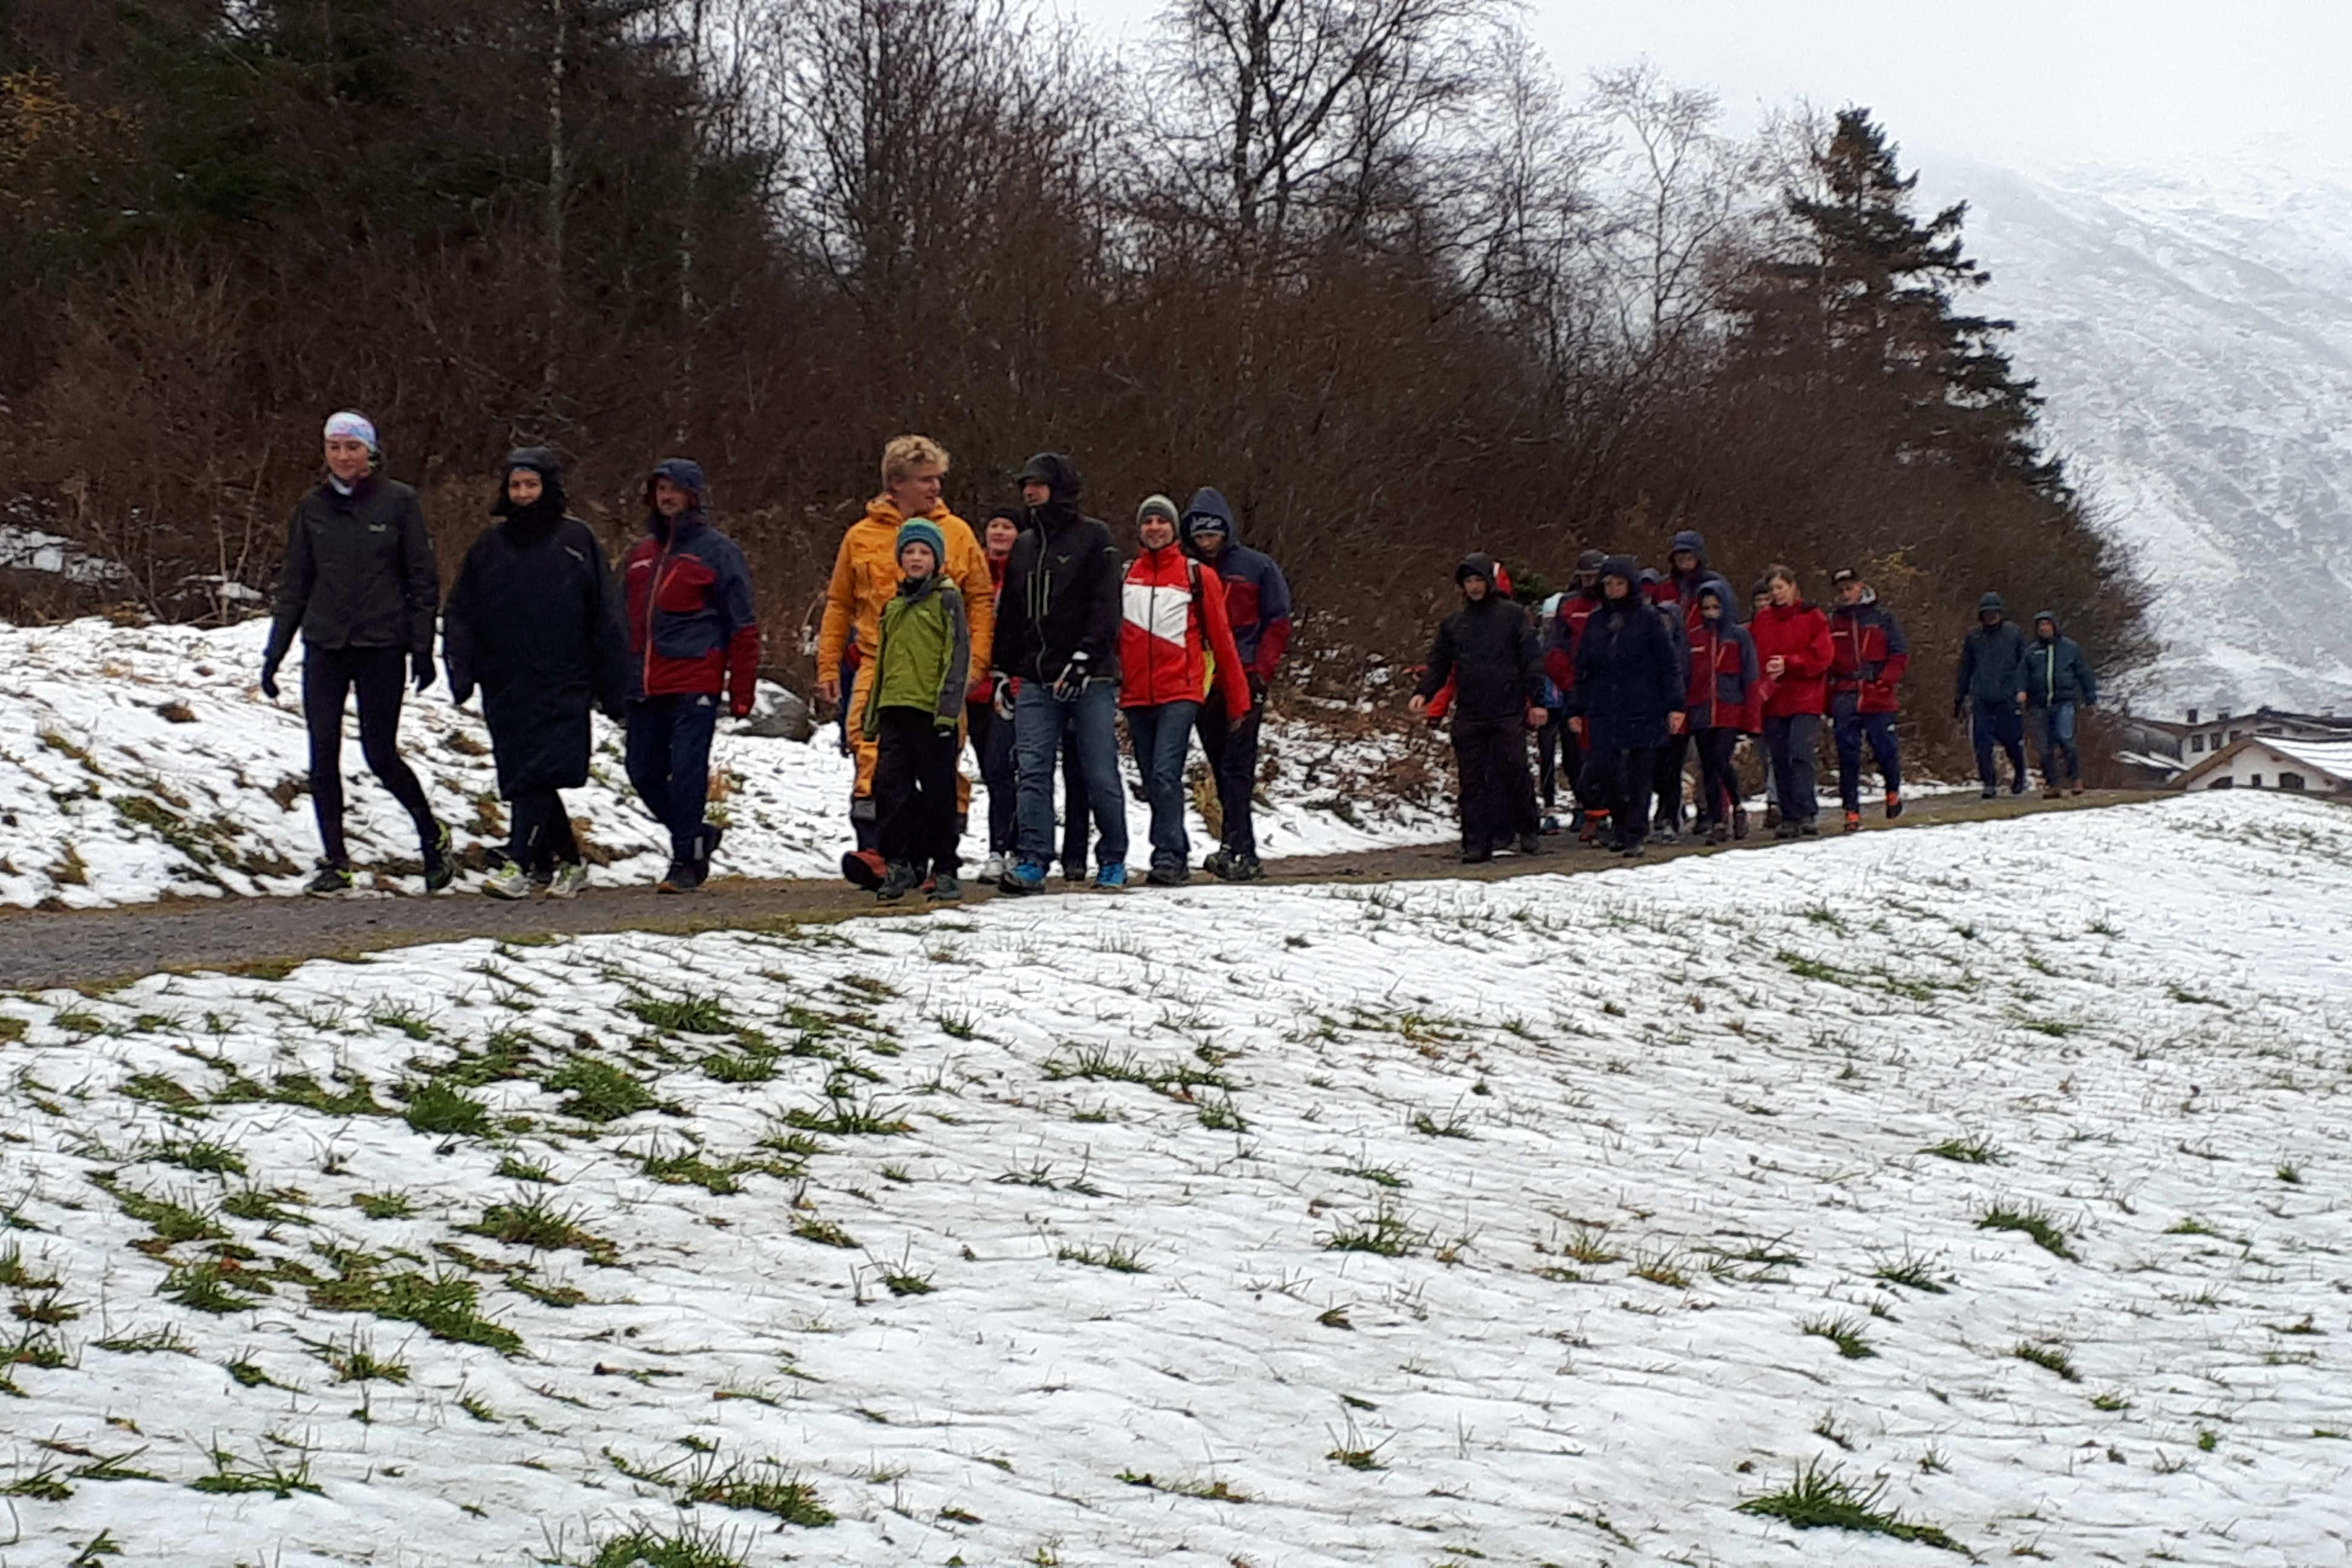 Gruppe spaziert auf Feldweg